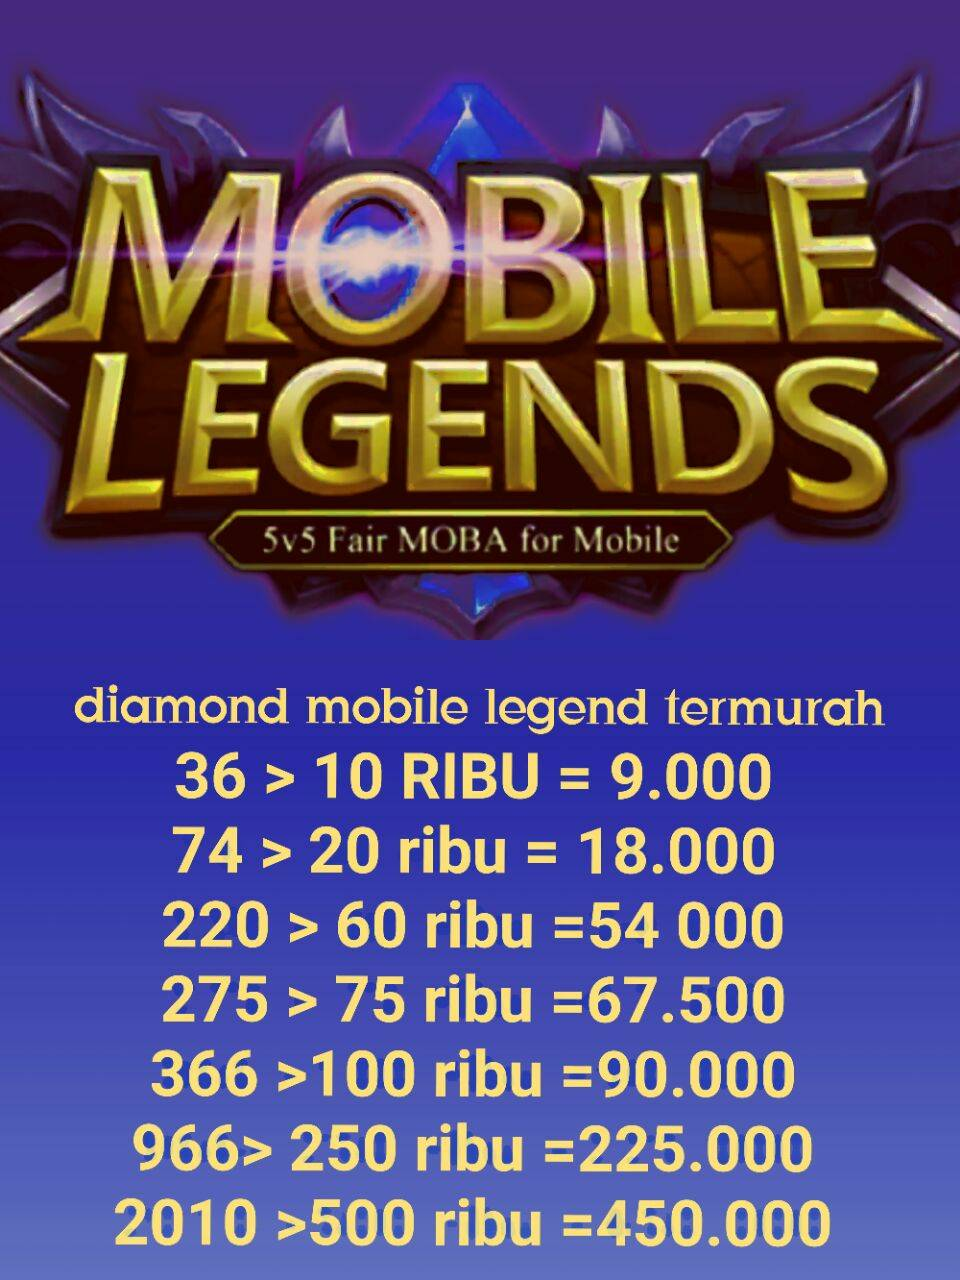 Jual Diamond Mobile Legends For Ios Dan Android 2010 Topup 220 Diamonds Legend Termurah Yd Top Up Tokopedia